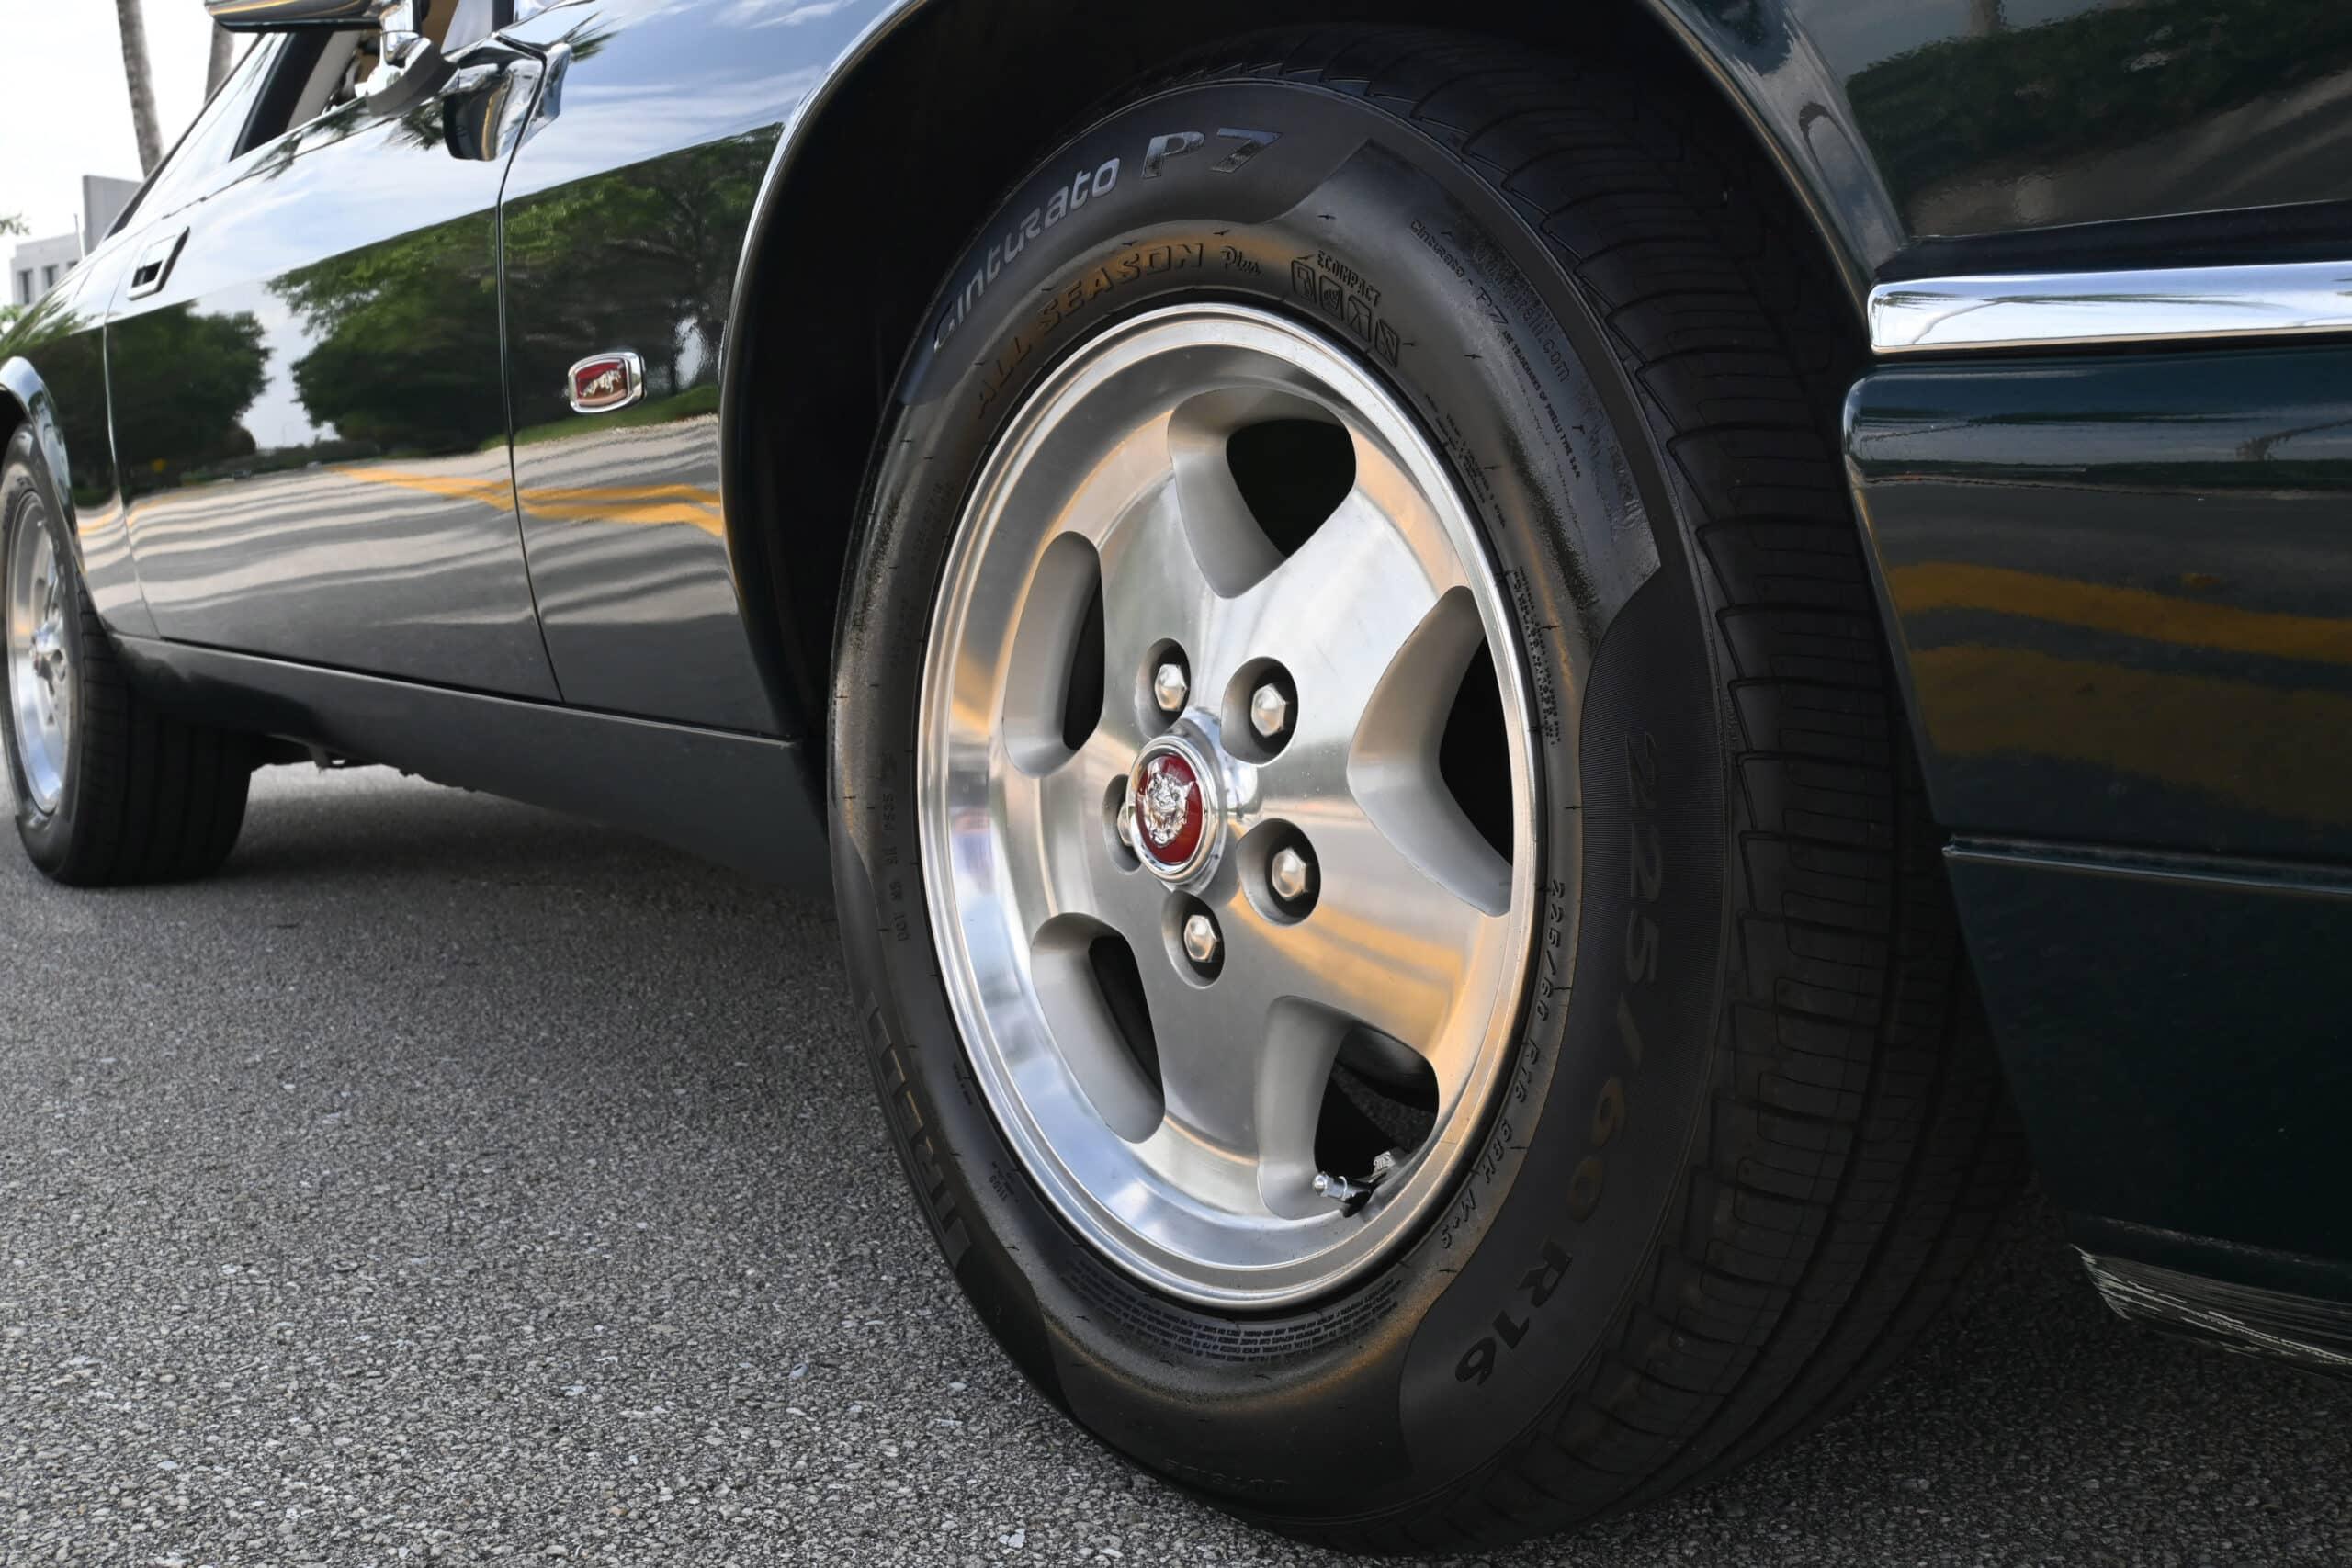 1995 Jaguar XJS, Rare Coupe, Collector grade quality, Low Miles Desirable AR16 engine, British Racing Green